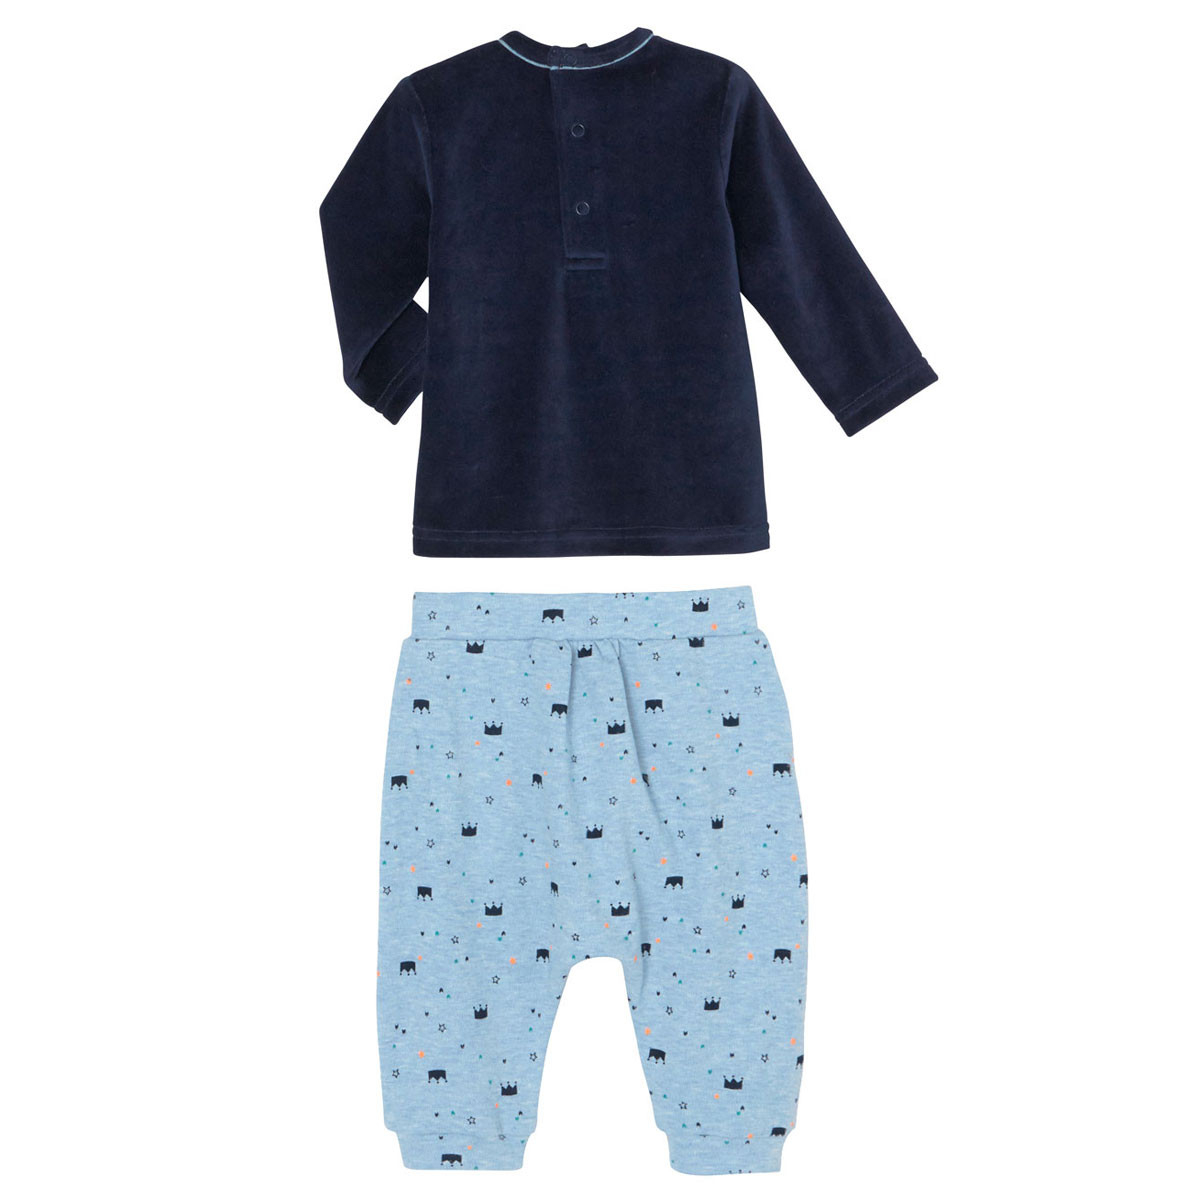 Ensemble bleu marine bébé garçon haut + sarouel hiver Petit Héros dos